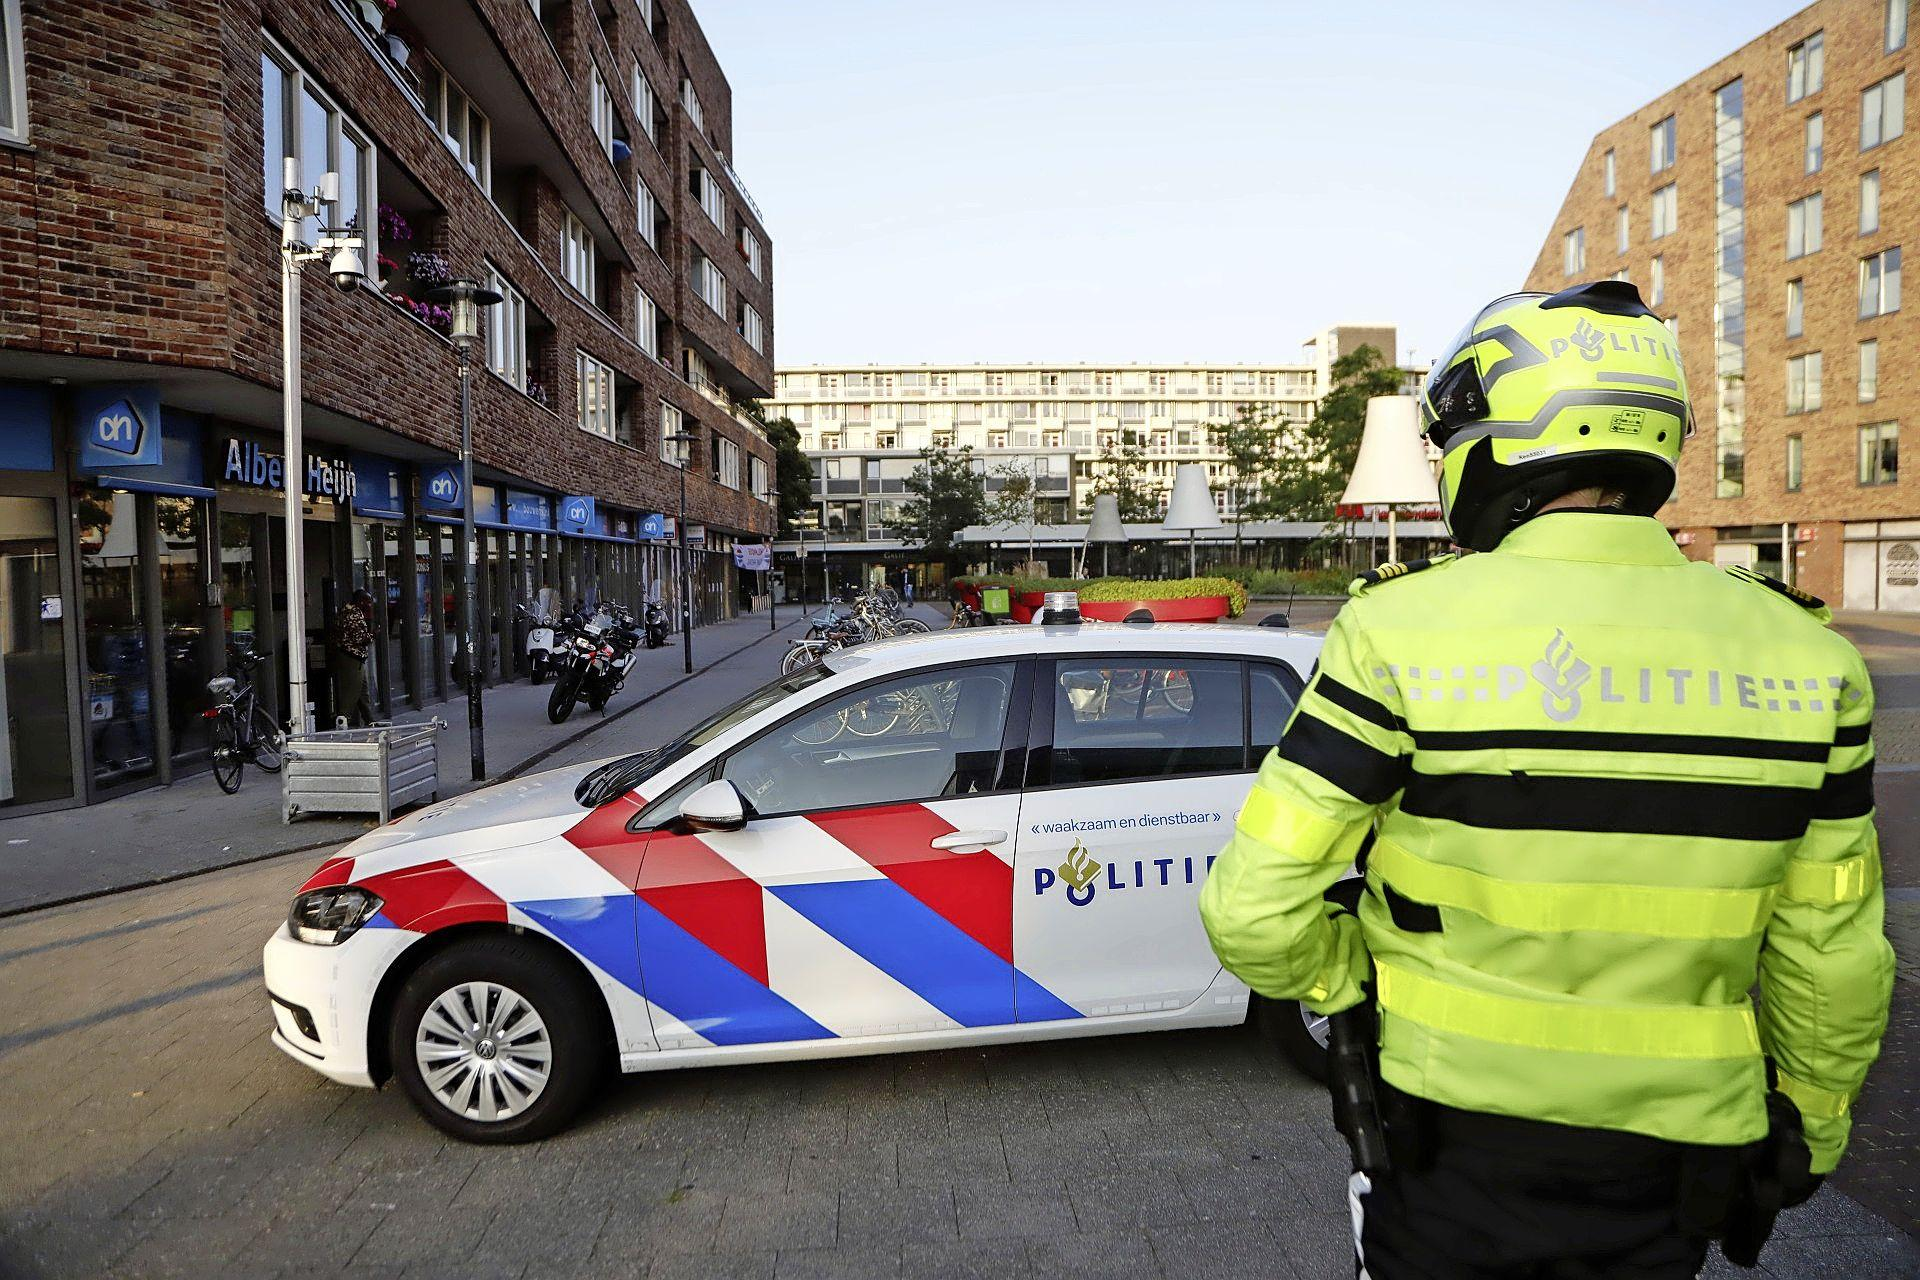 Toeval helpt politie: man met nepvuurwapen opgepakt in Haarlem-Noord